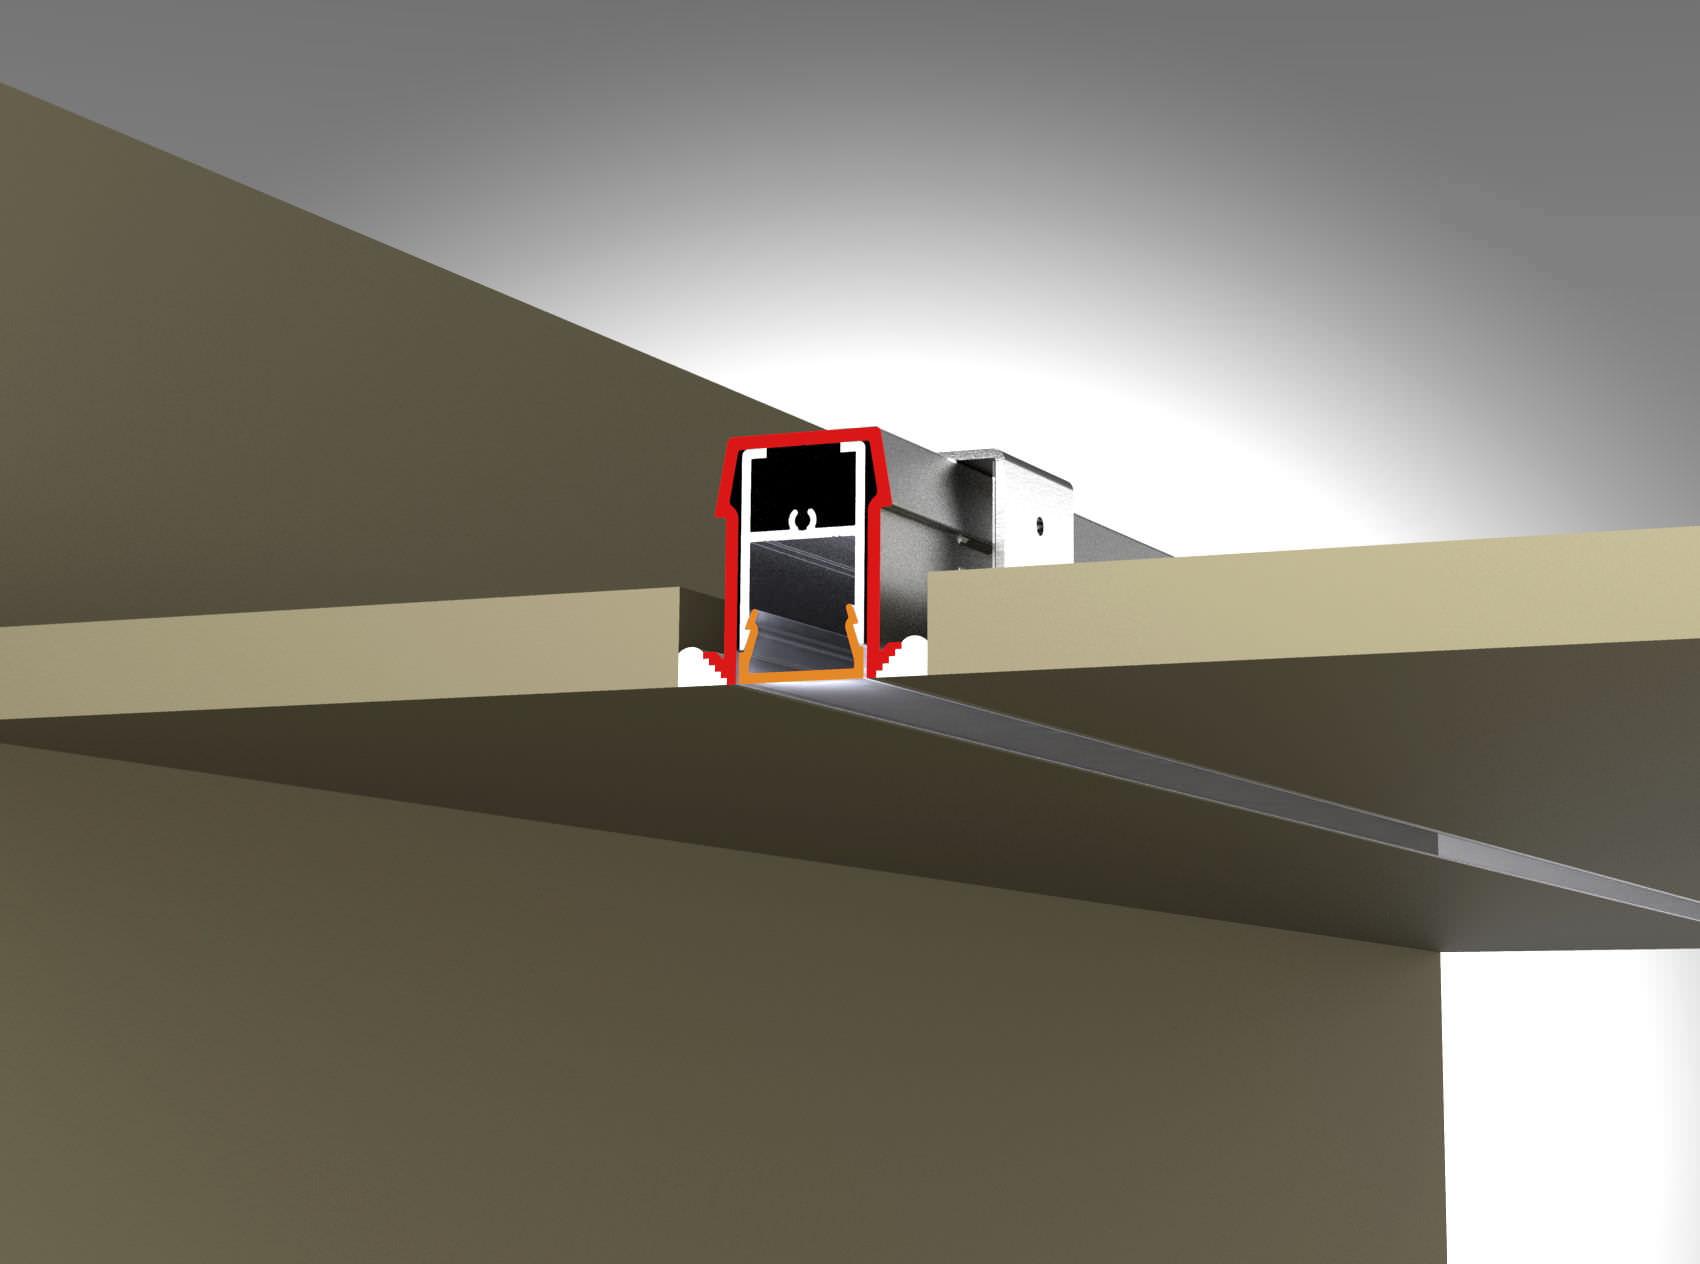 Recessed modular ceiling lights ceiling light ideas built in lighting profile led modular 1u r tal ceiling recessed lights aloadofball Choice Image